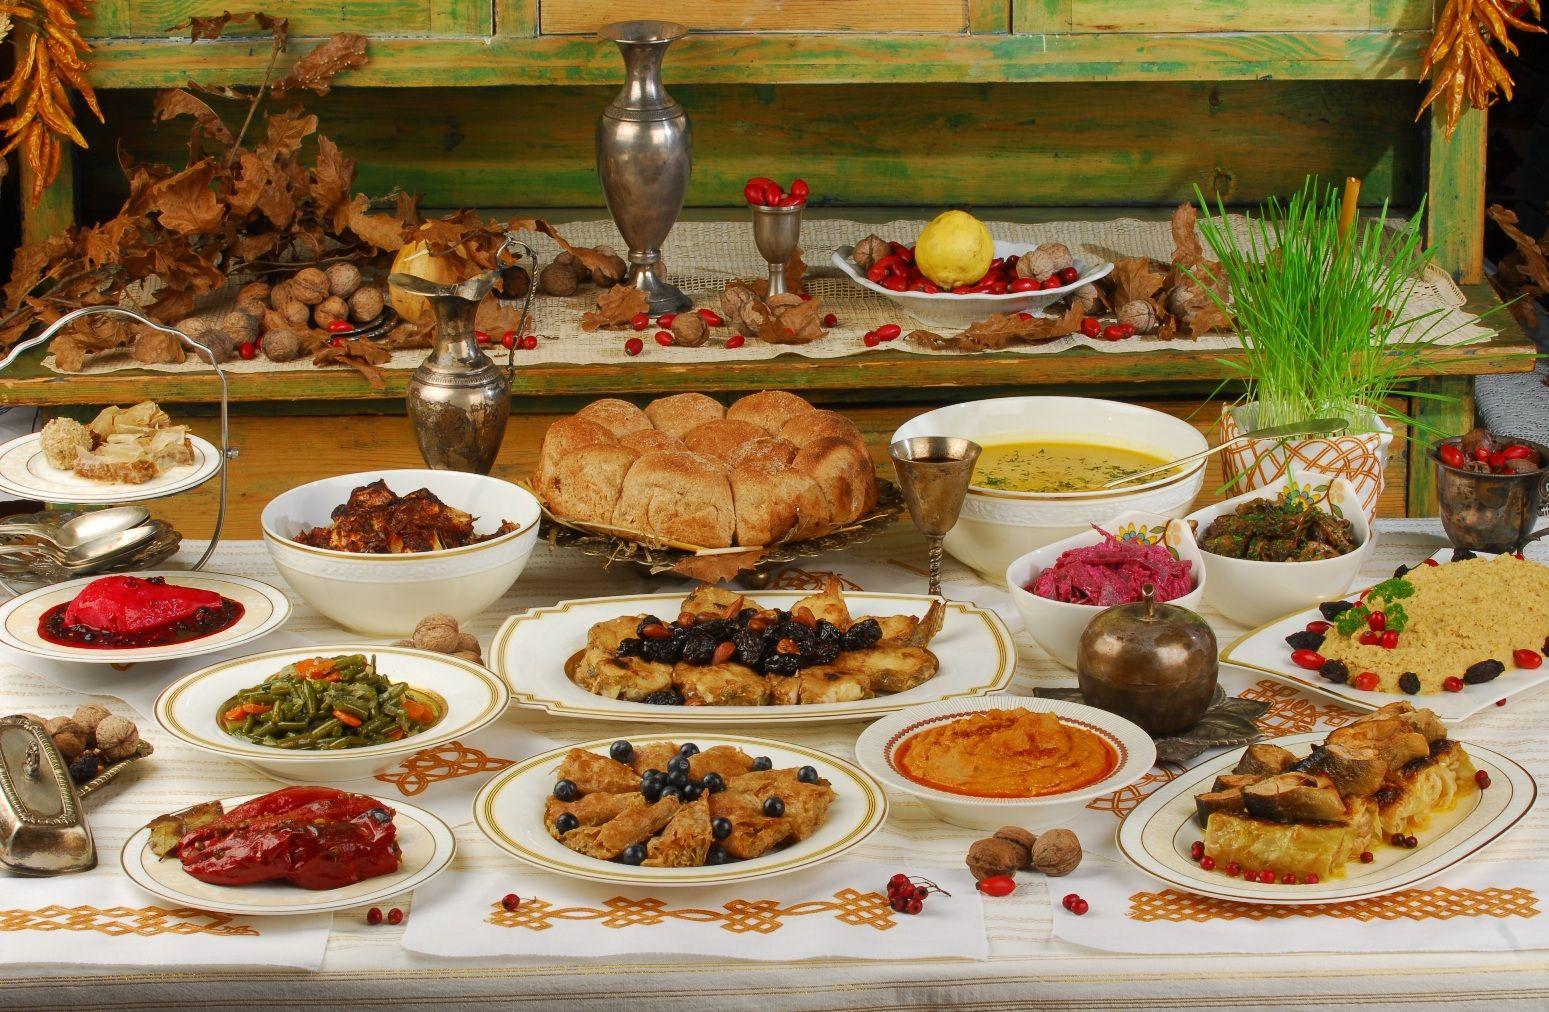 Russian Christmas Dinners  Orthodox Christmas Eve on January 6th according to Julian